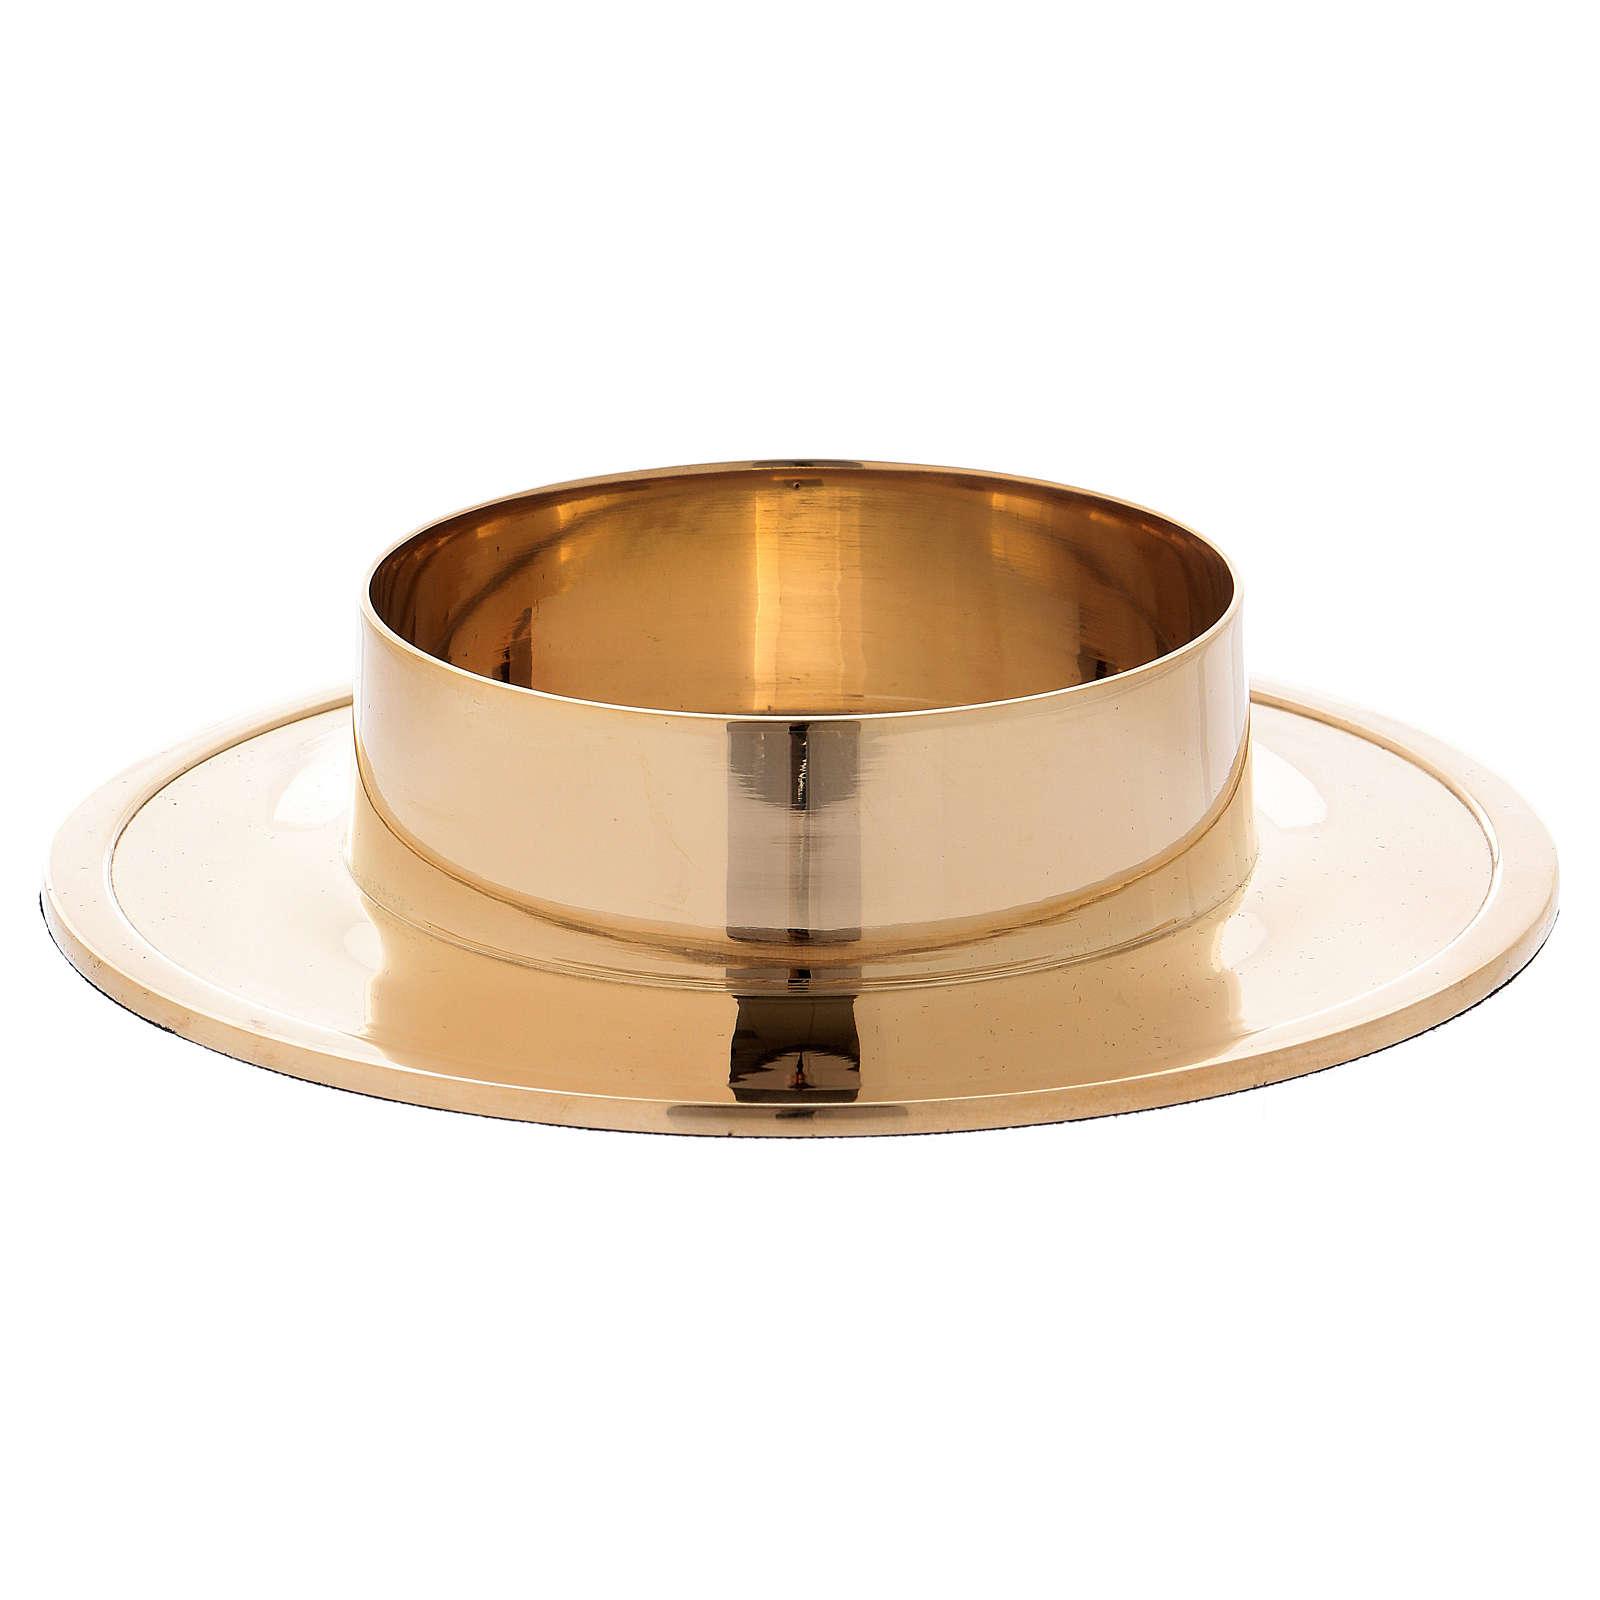 Porte-cierge simple laiton doré diam. 8 cm 4